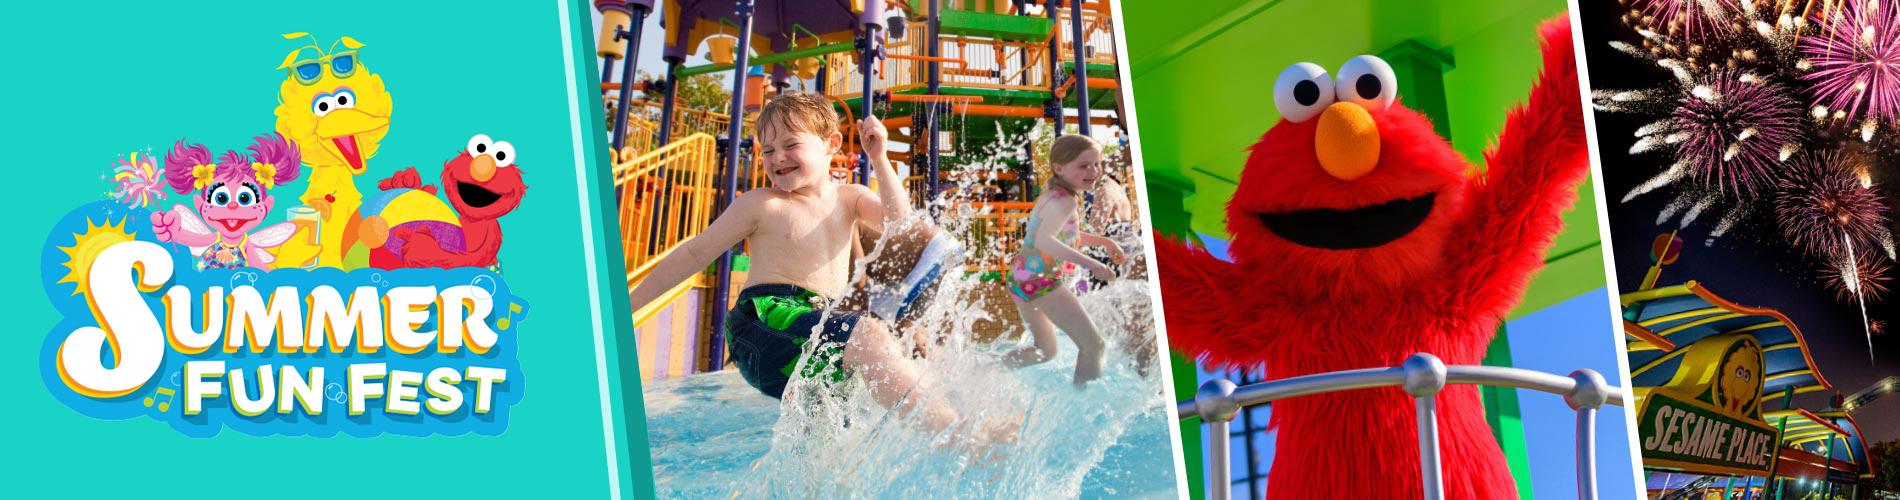 Splashy Summer Fun at Sesame Place